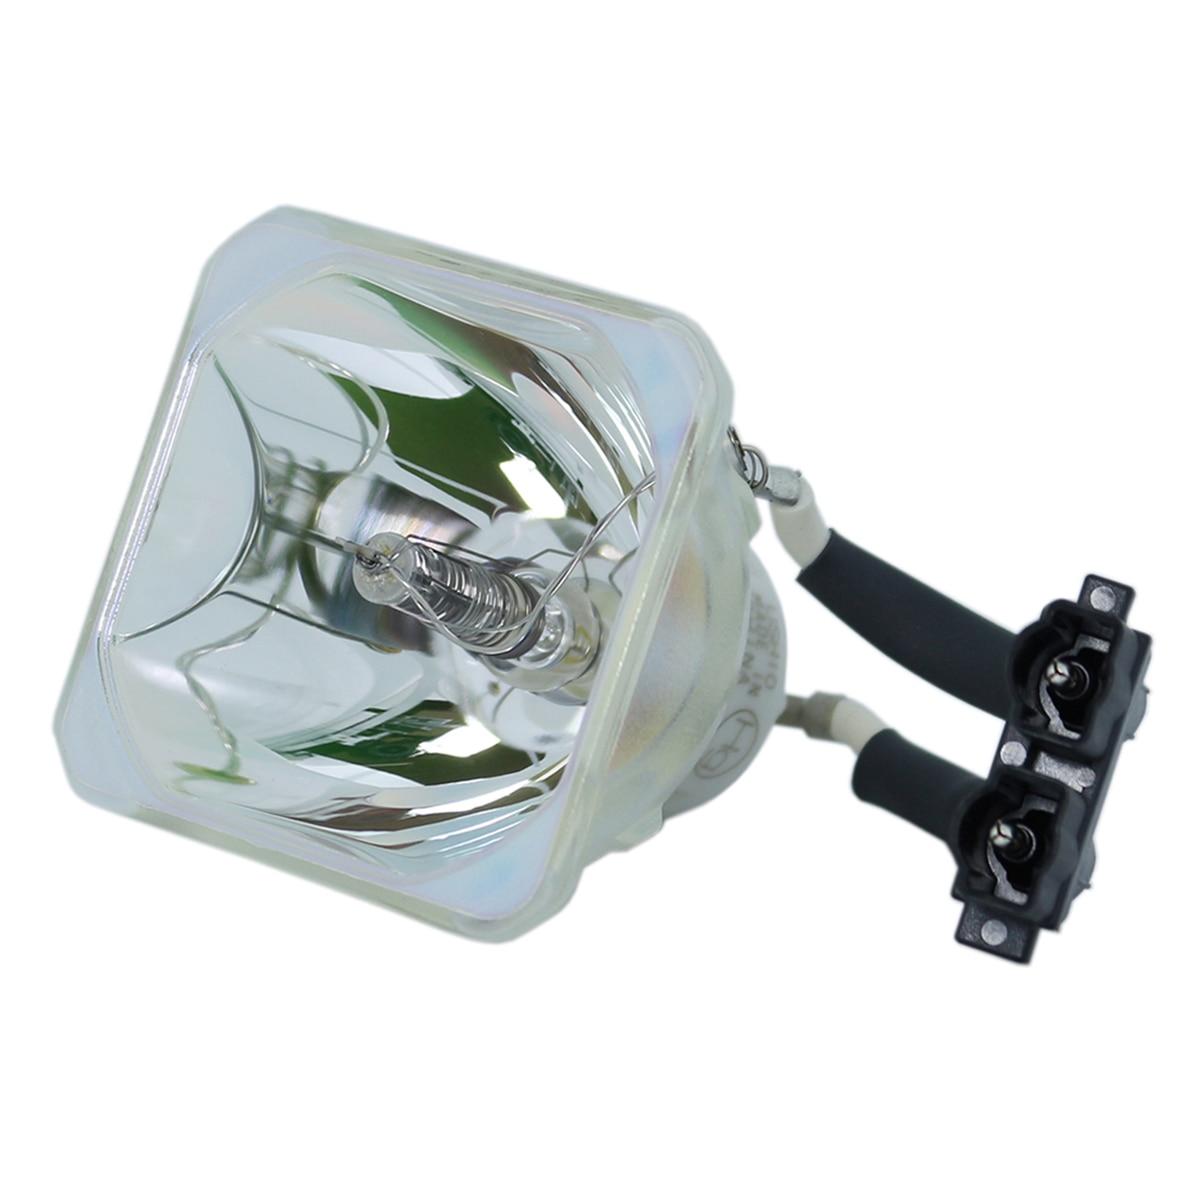 Compatible Bare Bulb VLT-XL4LP VLTXL4LP for MITSUBISHI SL4U SL4 SL4SU XL4 XL4U XL8U Projector Bulb Lamp without housing